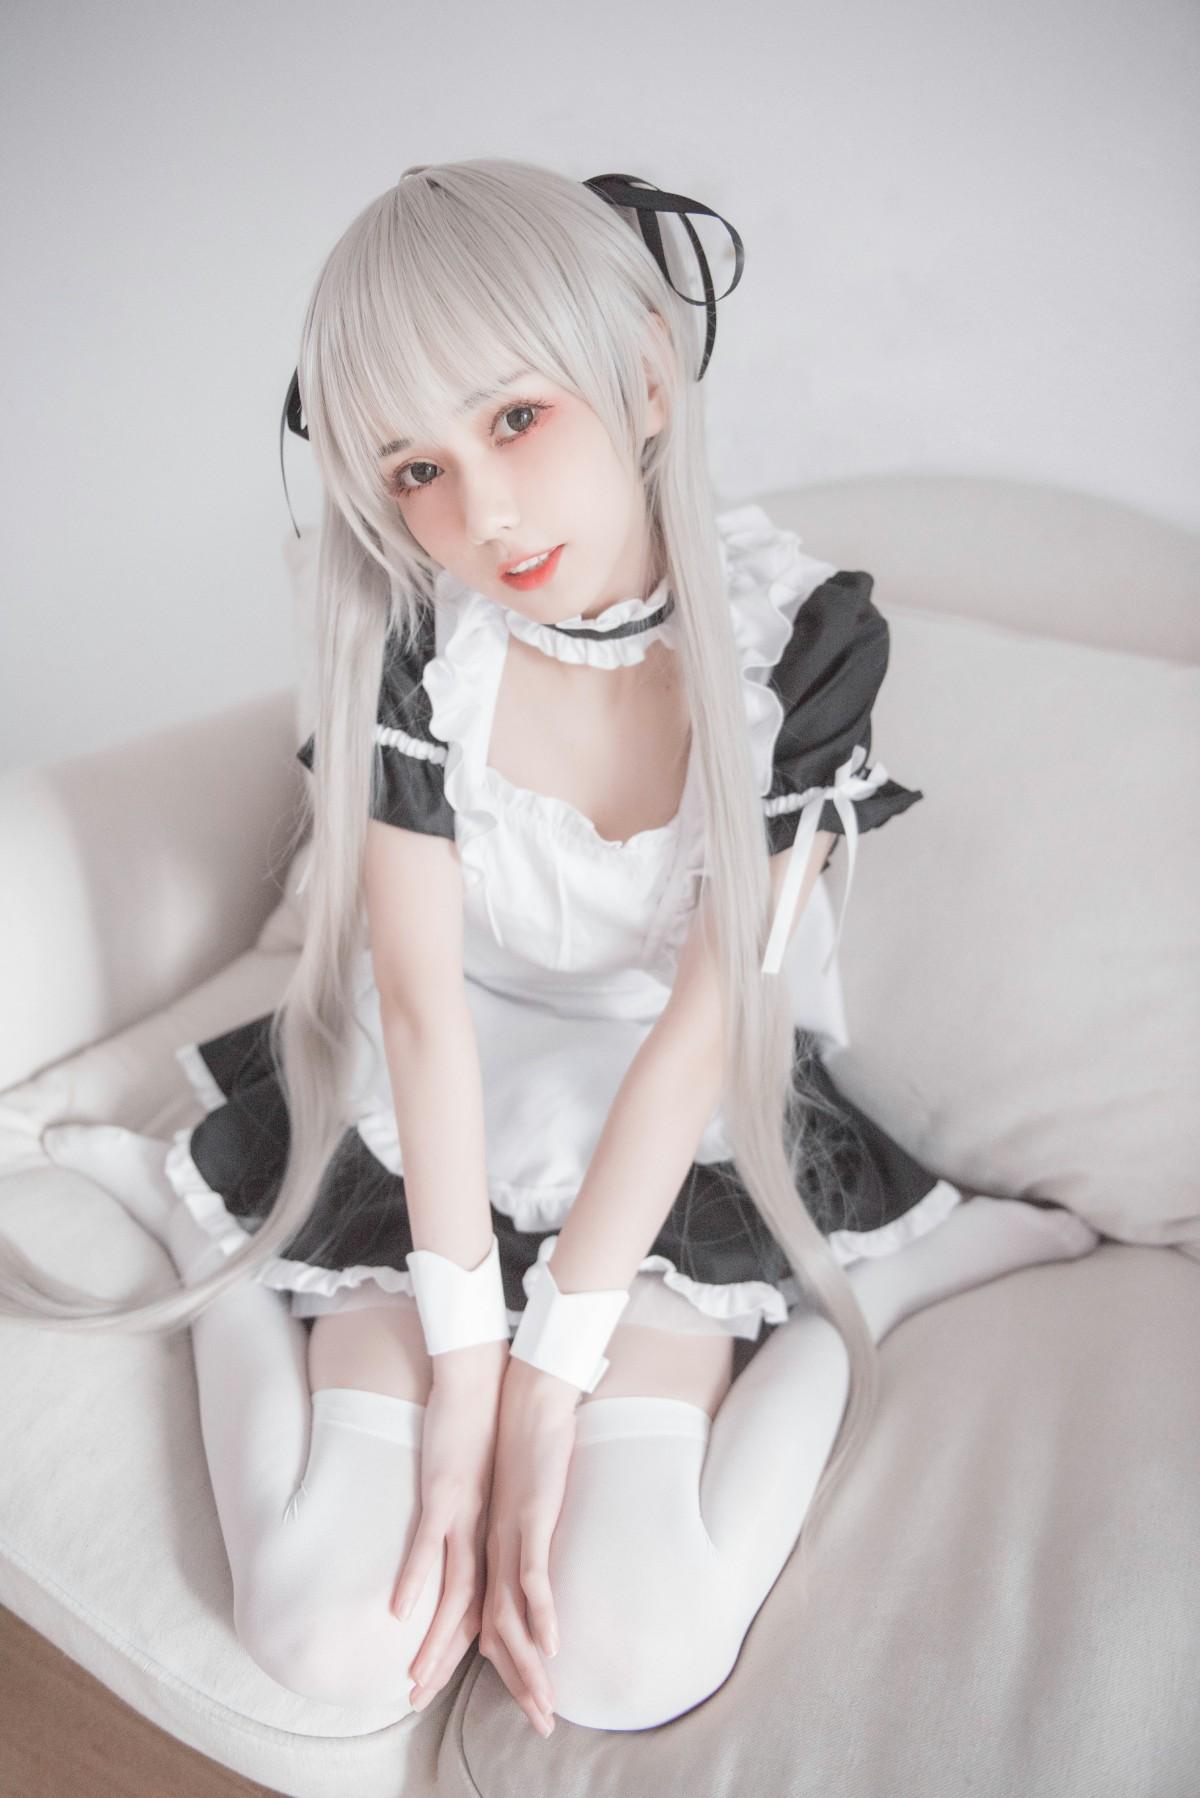 [Cosplay]你的负卿 穹妹女仆兔女郎[30P] 角色扮演 第1张